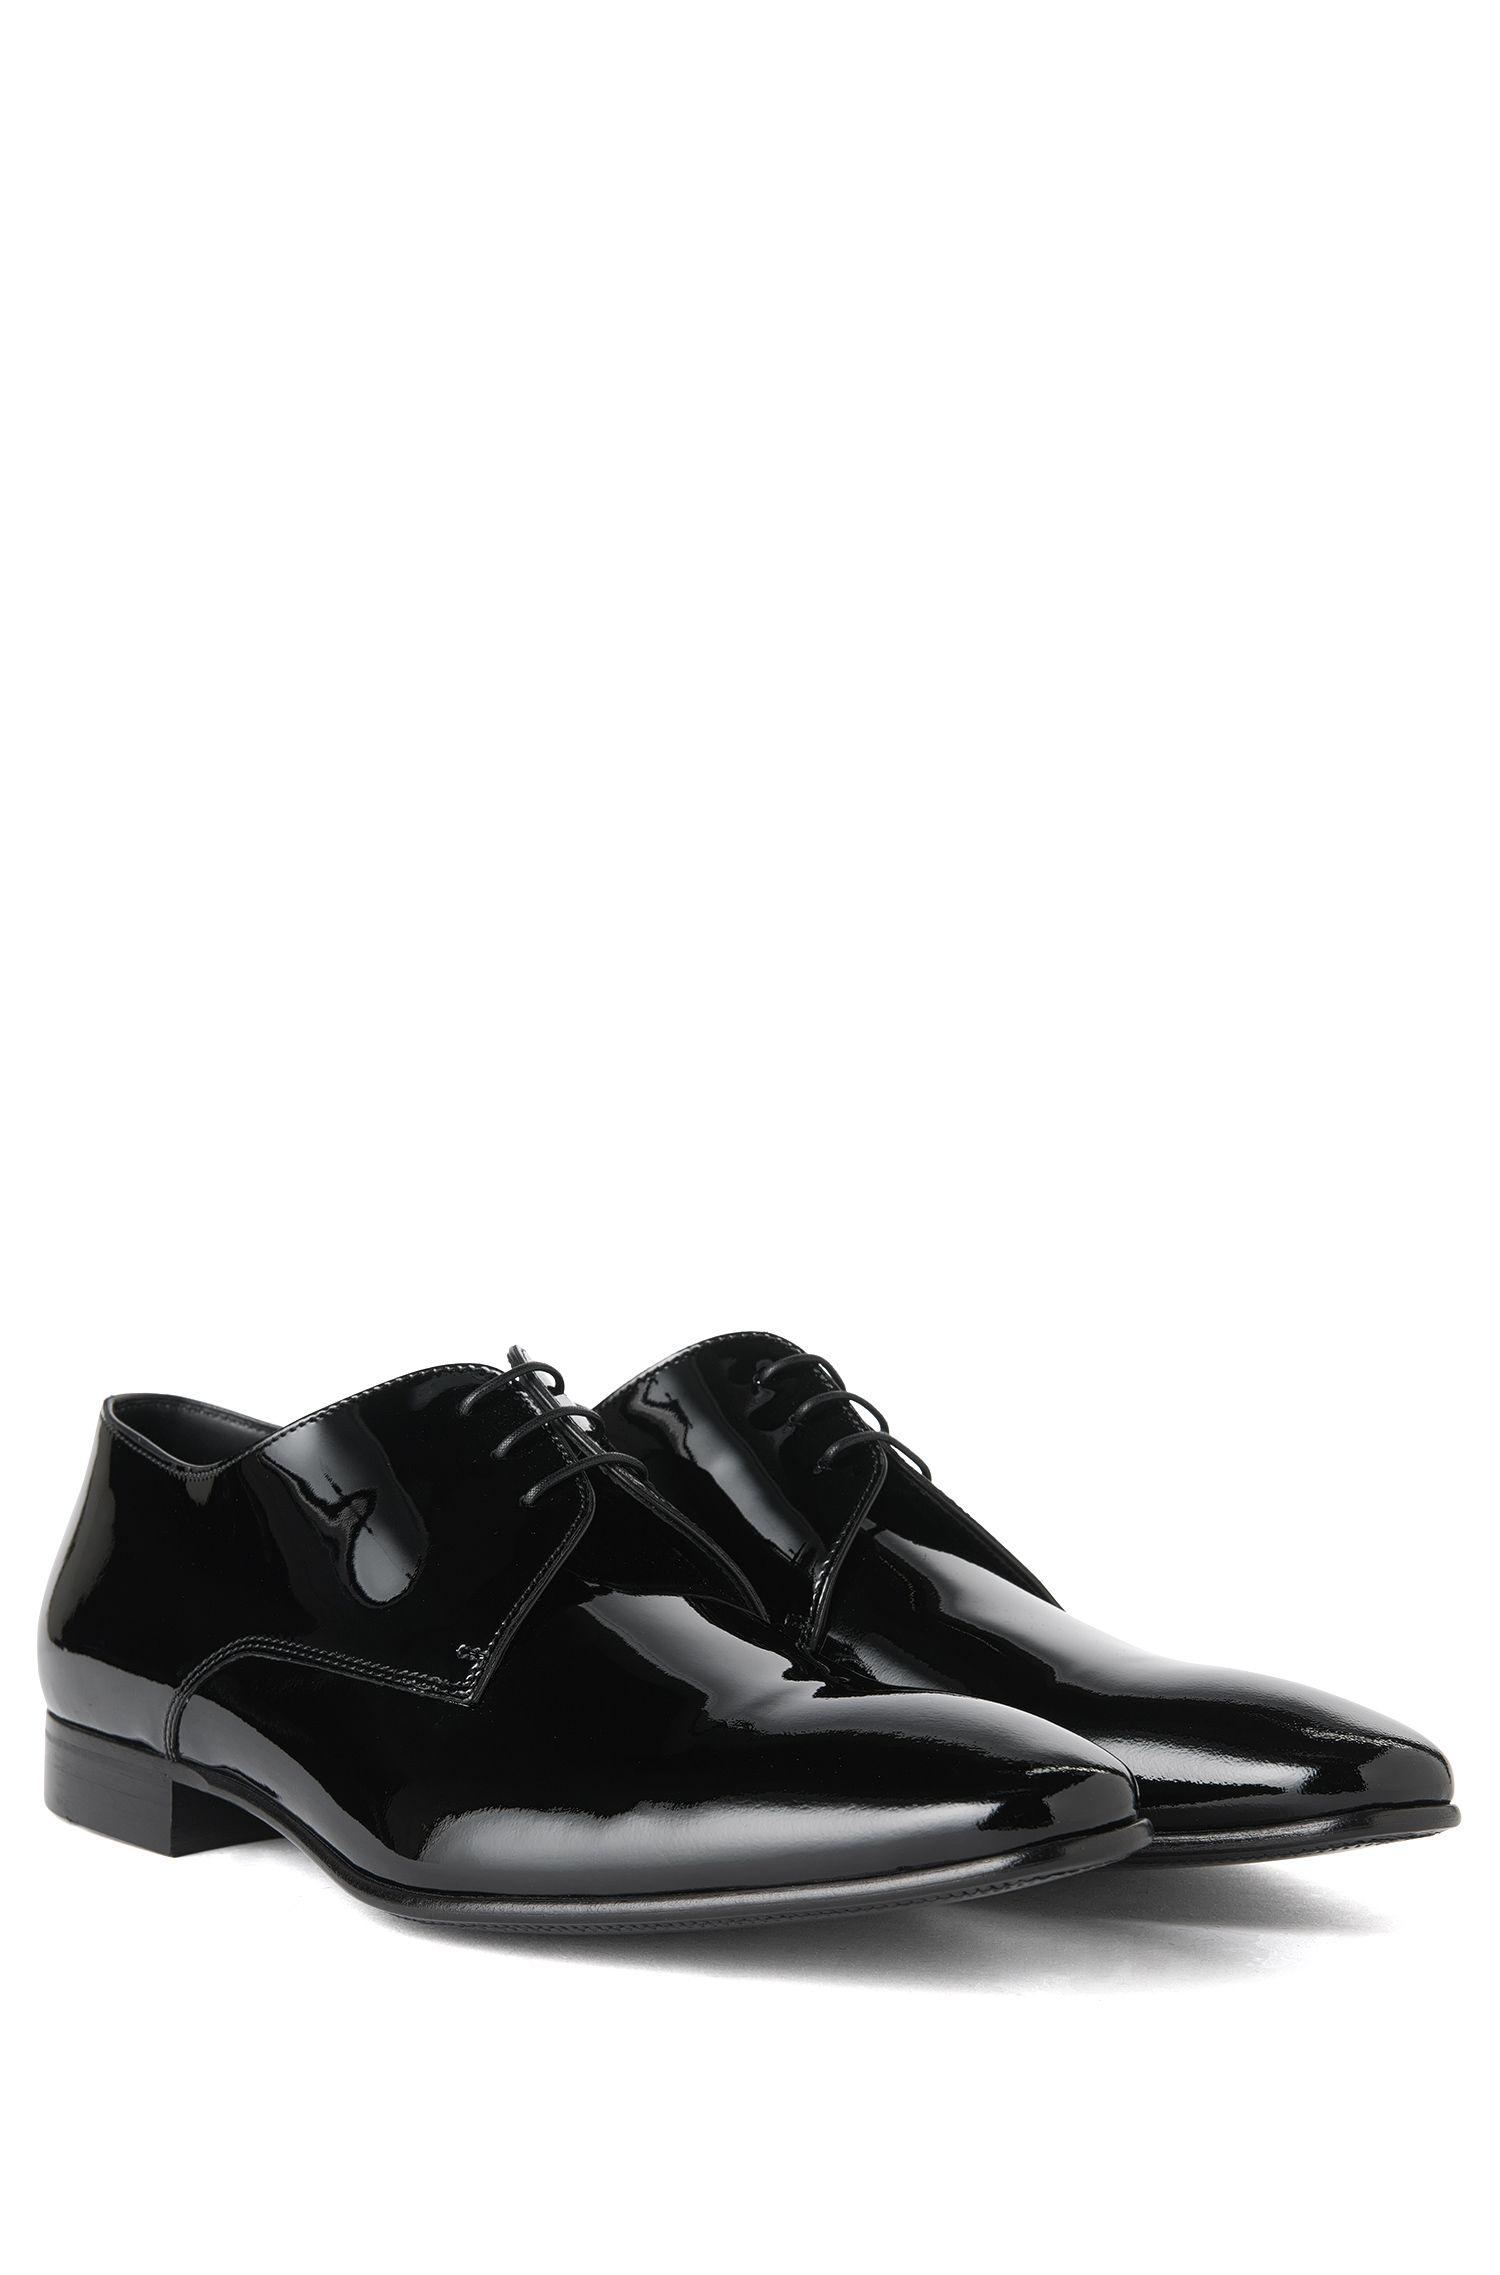 BOSS Hugo Boss Italian Patent Leather Derby Tuxedo Shoe Cristallo 11.5 Black